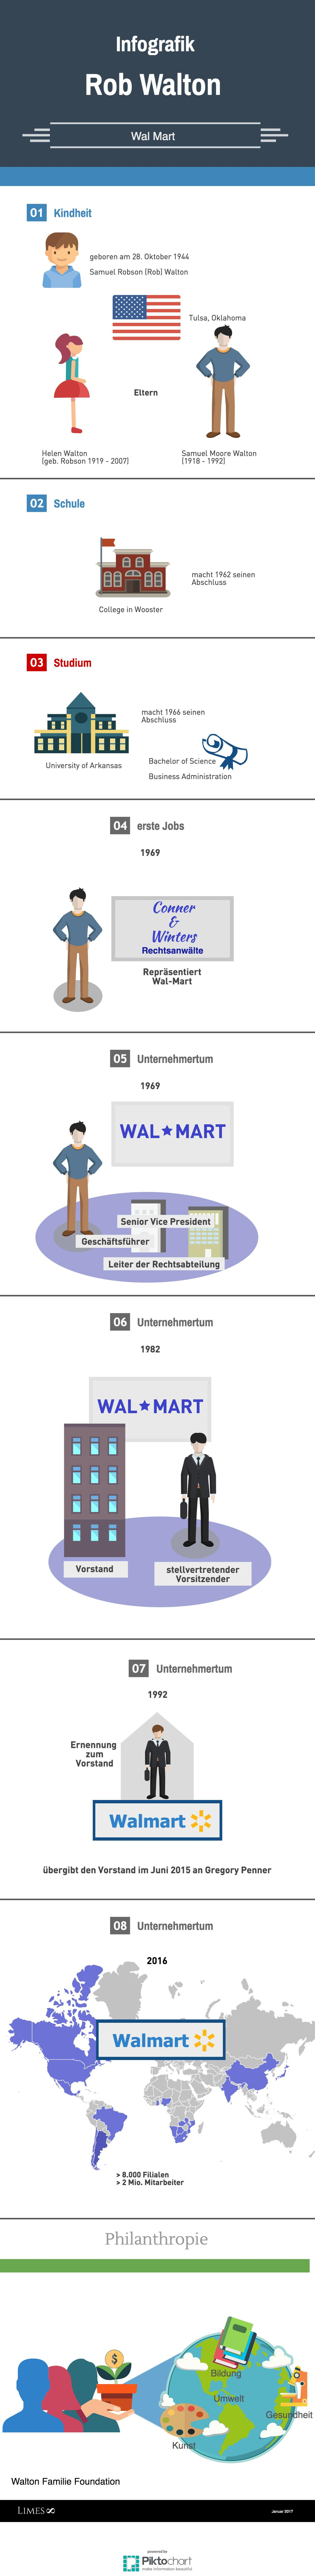 Informationsgrafik des Milliardärs S. Robson Walton